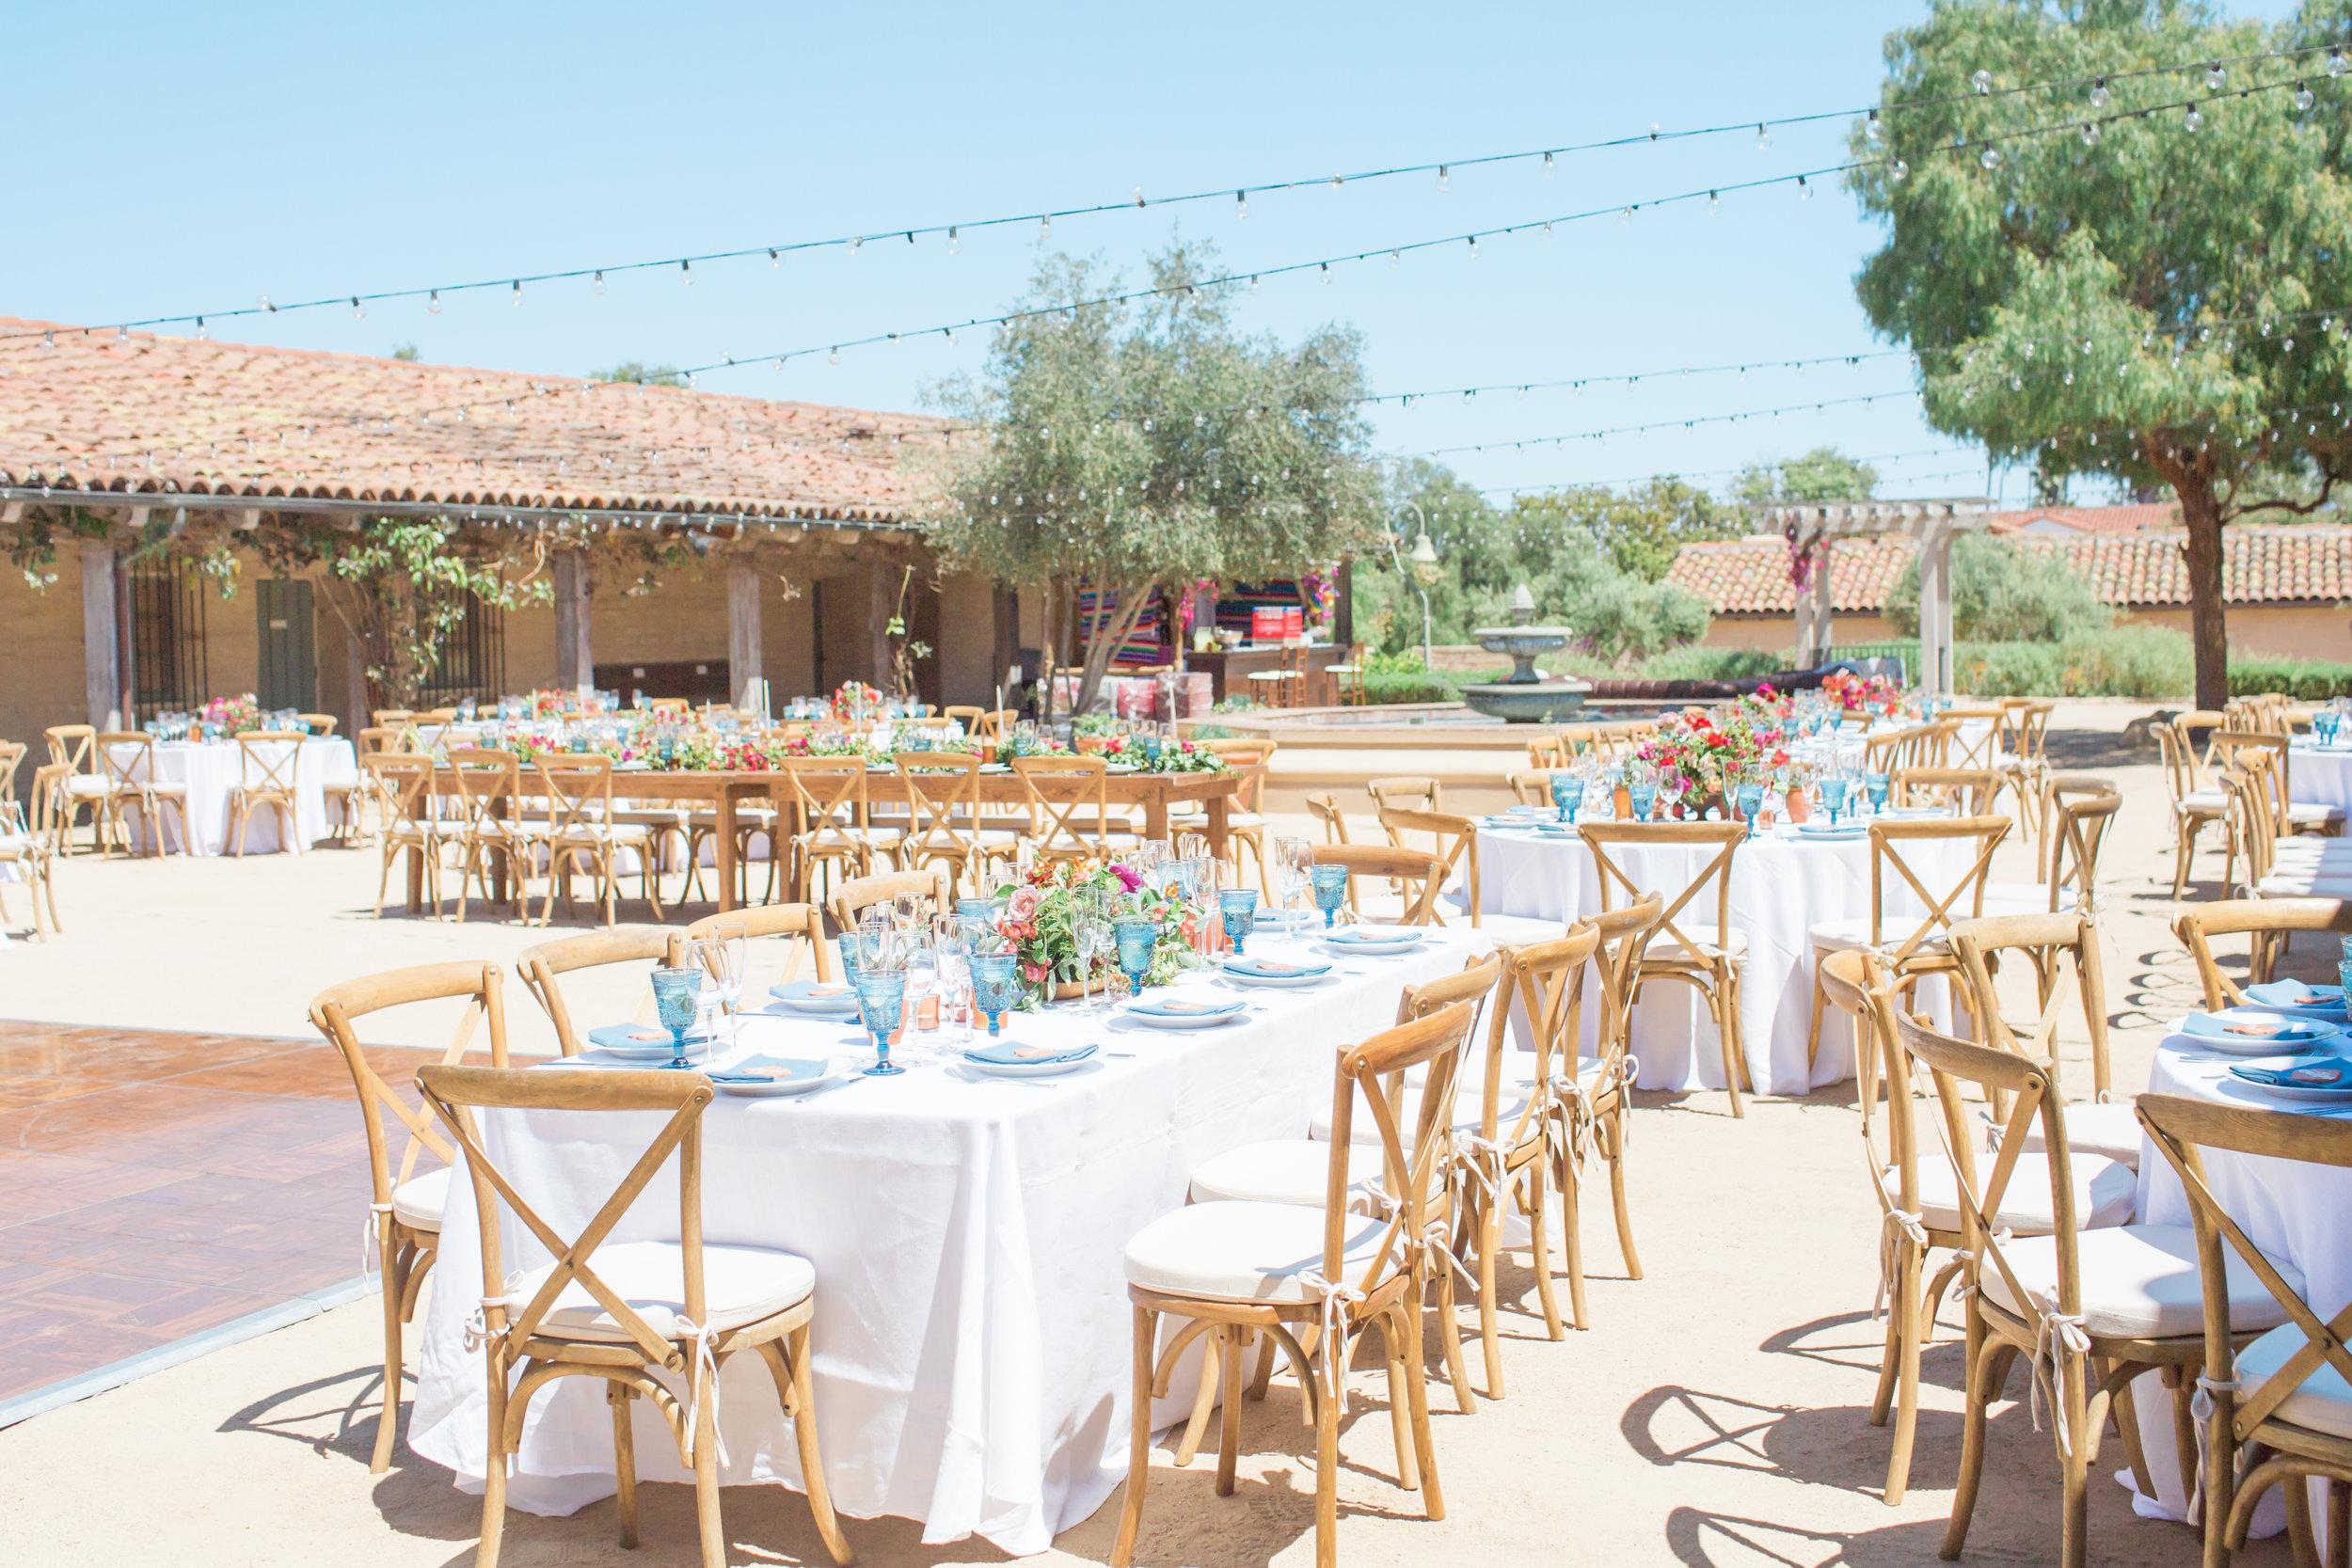 www.santabarbarawedding.com | James and Jess Photography | Santa Barbara Historical | Amazing Day Events | La Fleur du Jour | La Tavola | Classic Party Rentals | Reception Tables